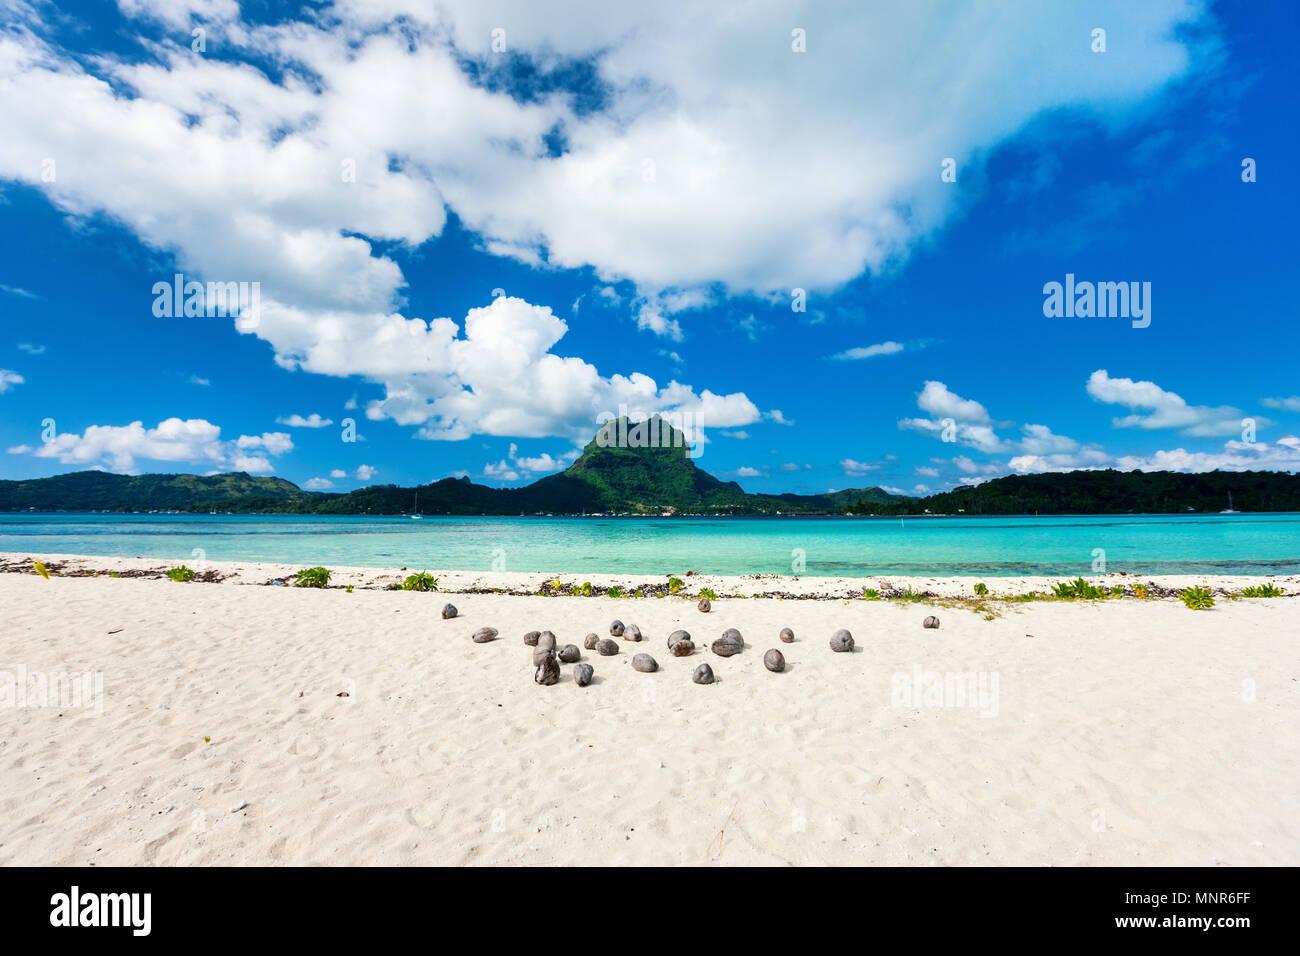 Beautiful beach with a view of Otemanu mountain on Bora Bora island - Stock Image